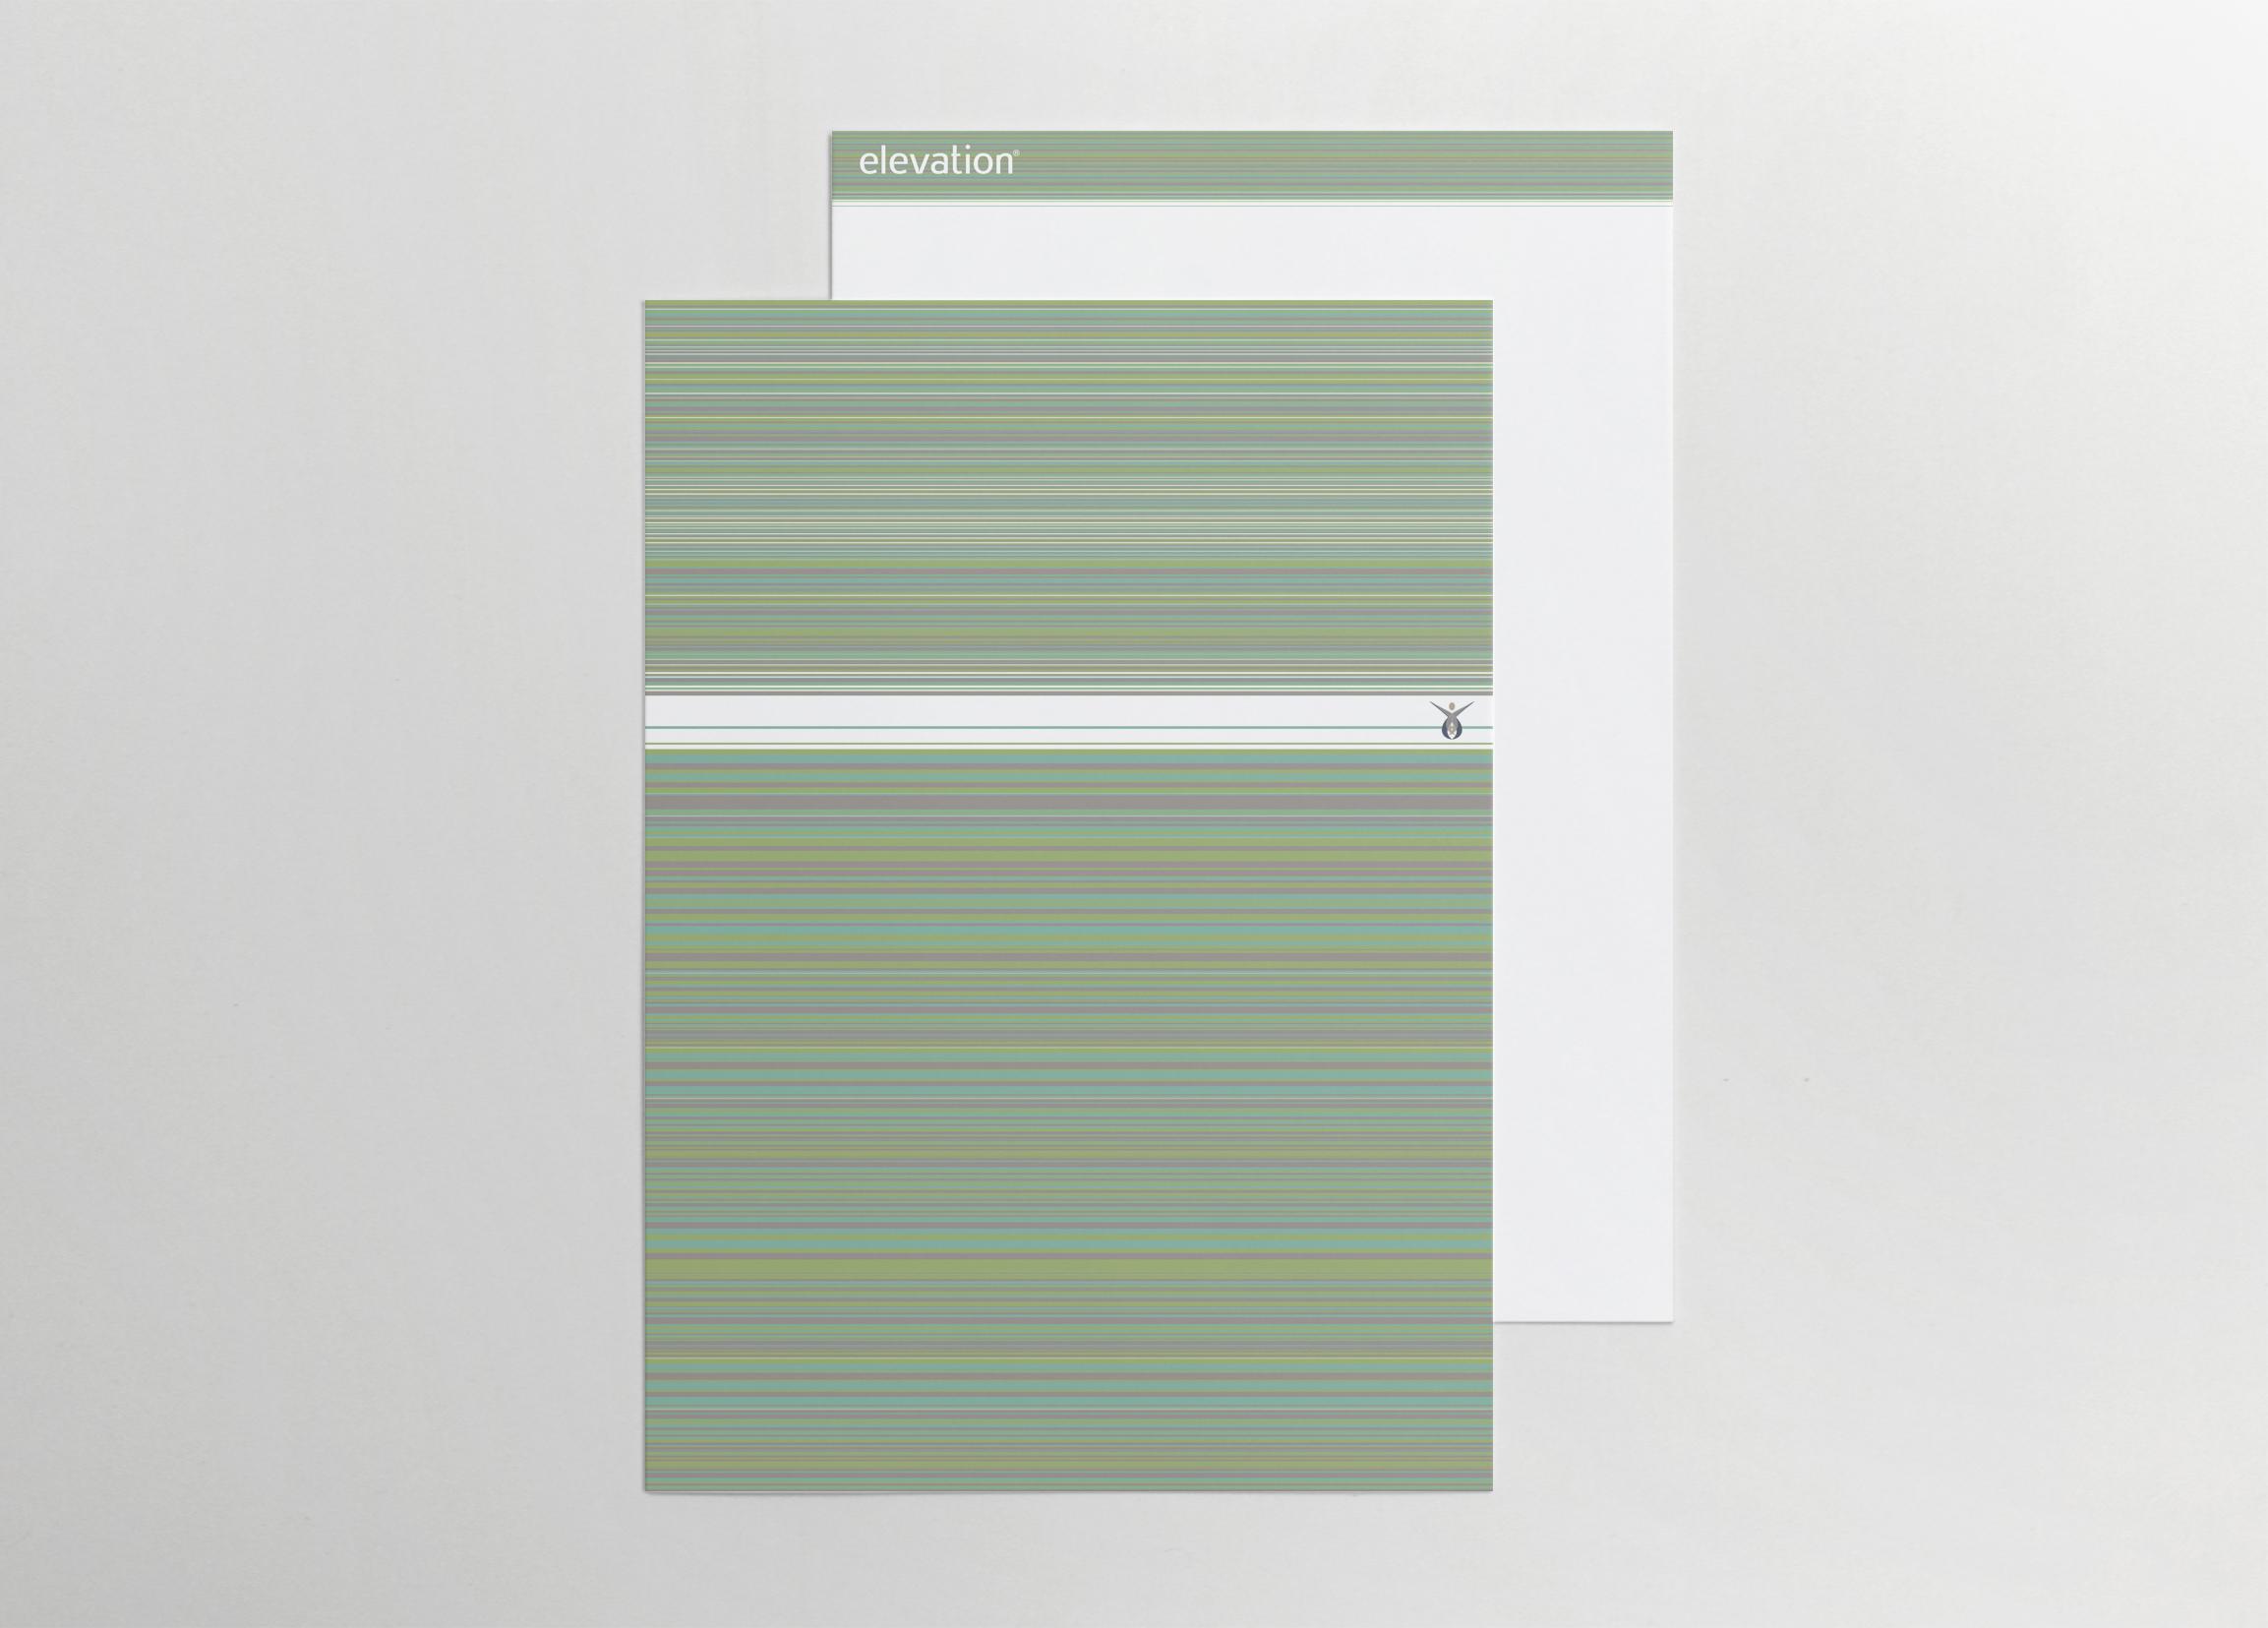 3D_elevation_stationery.jpg